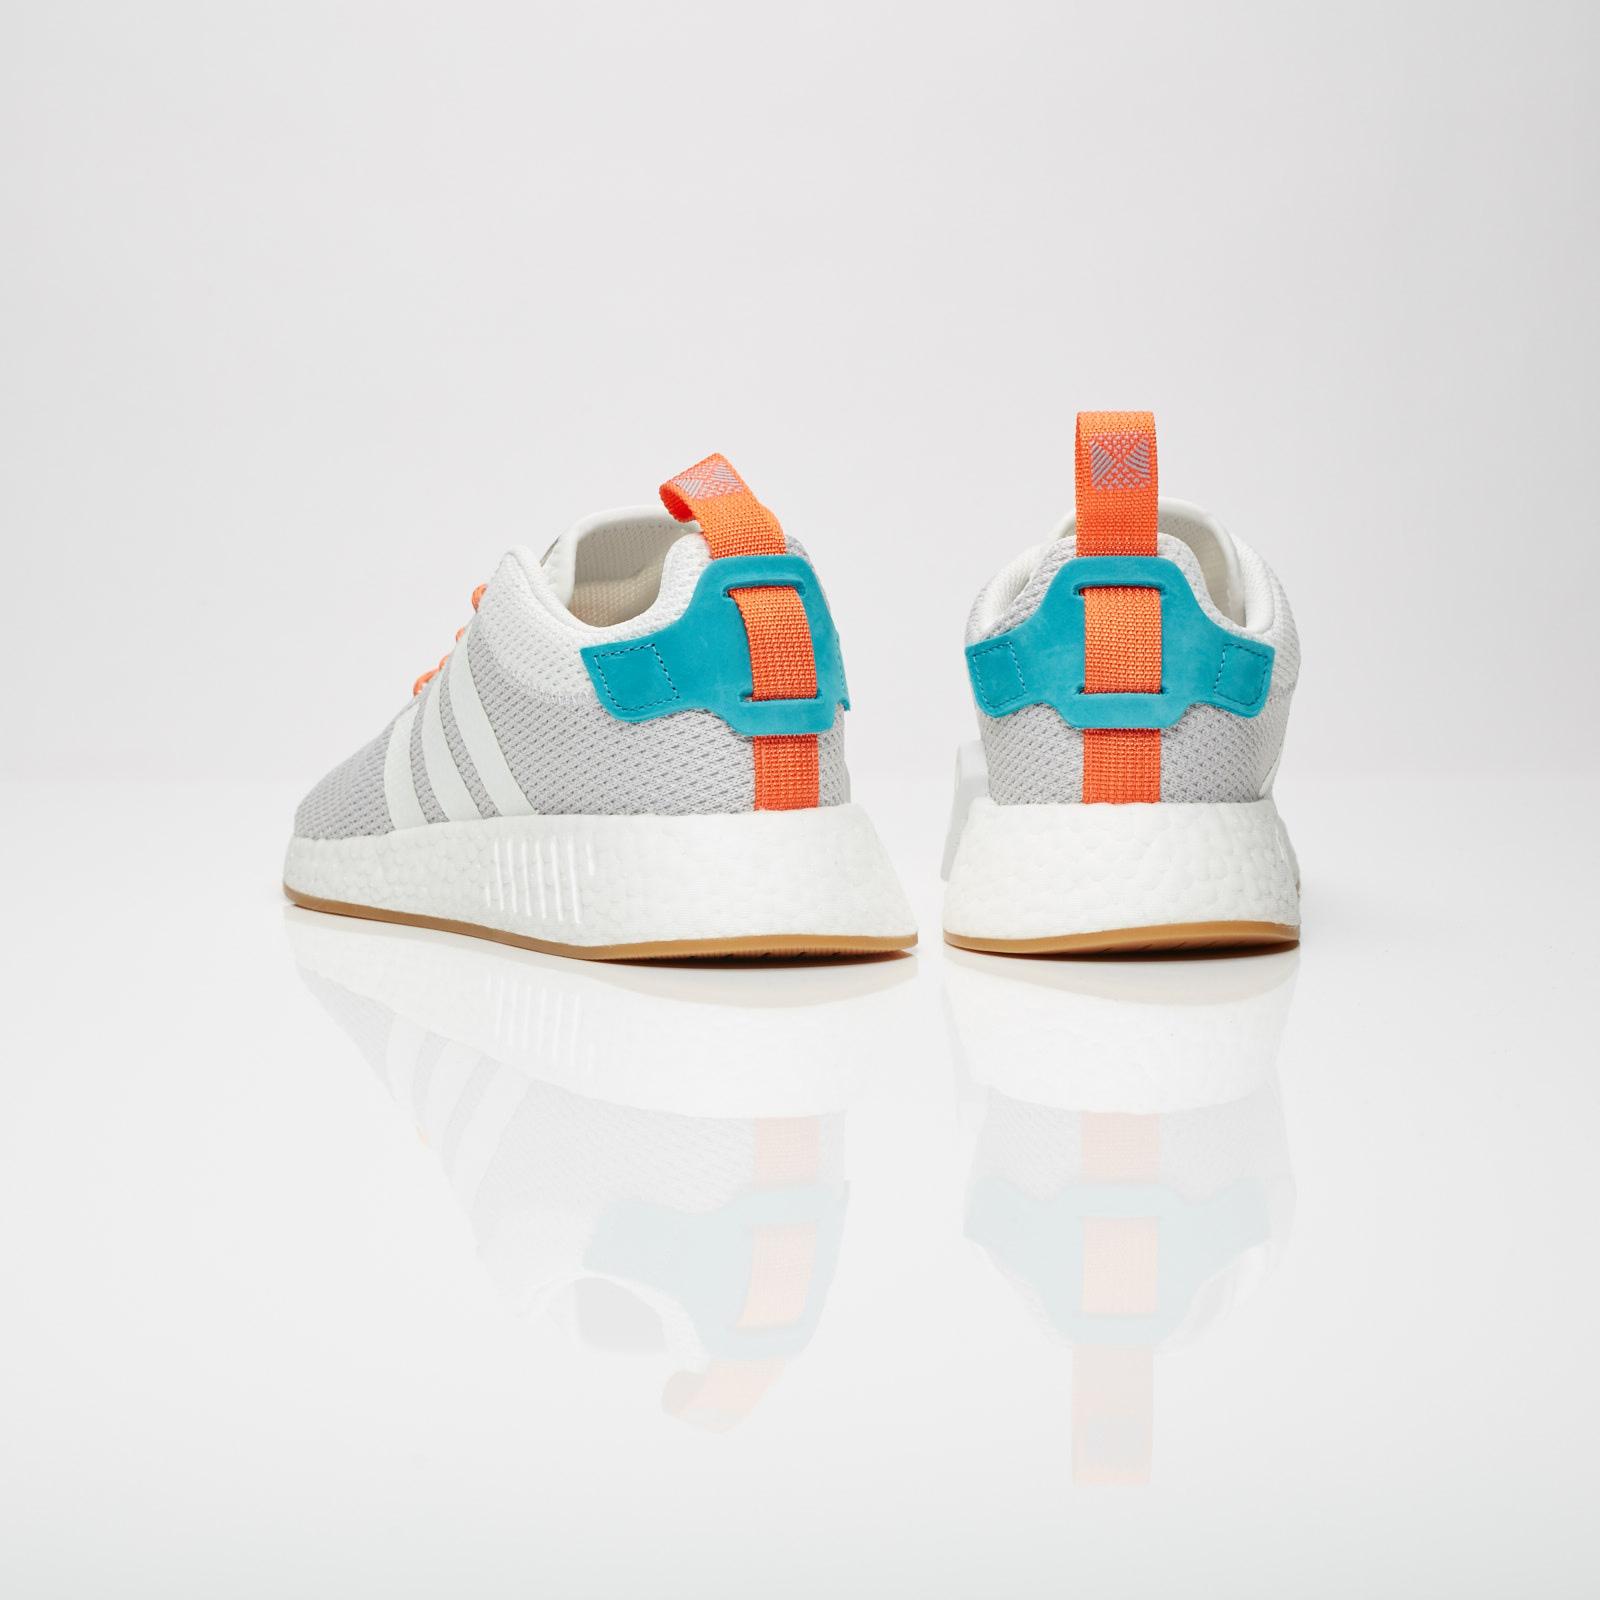 dbb4ddc9c4a6d adidas NMD R2 Summer - Cq3080 - Sneakersnstuff